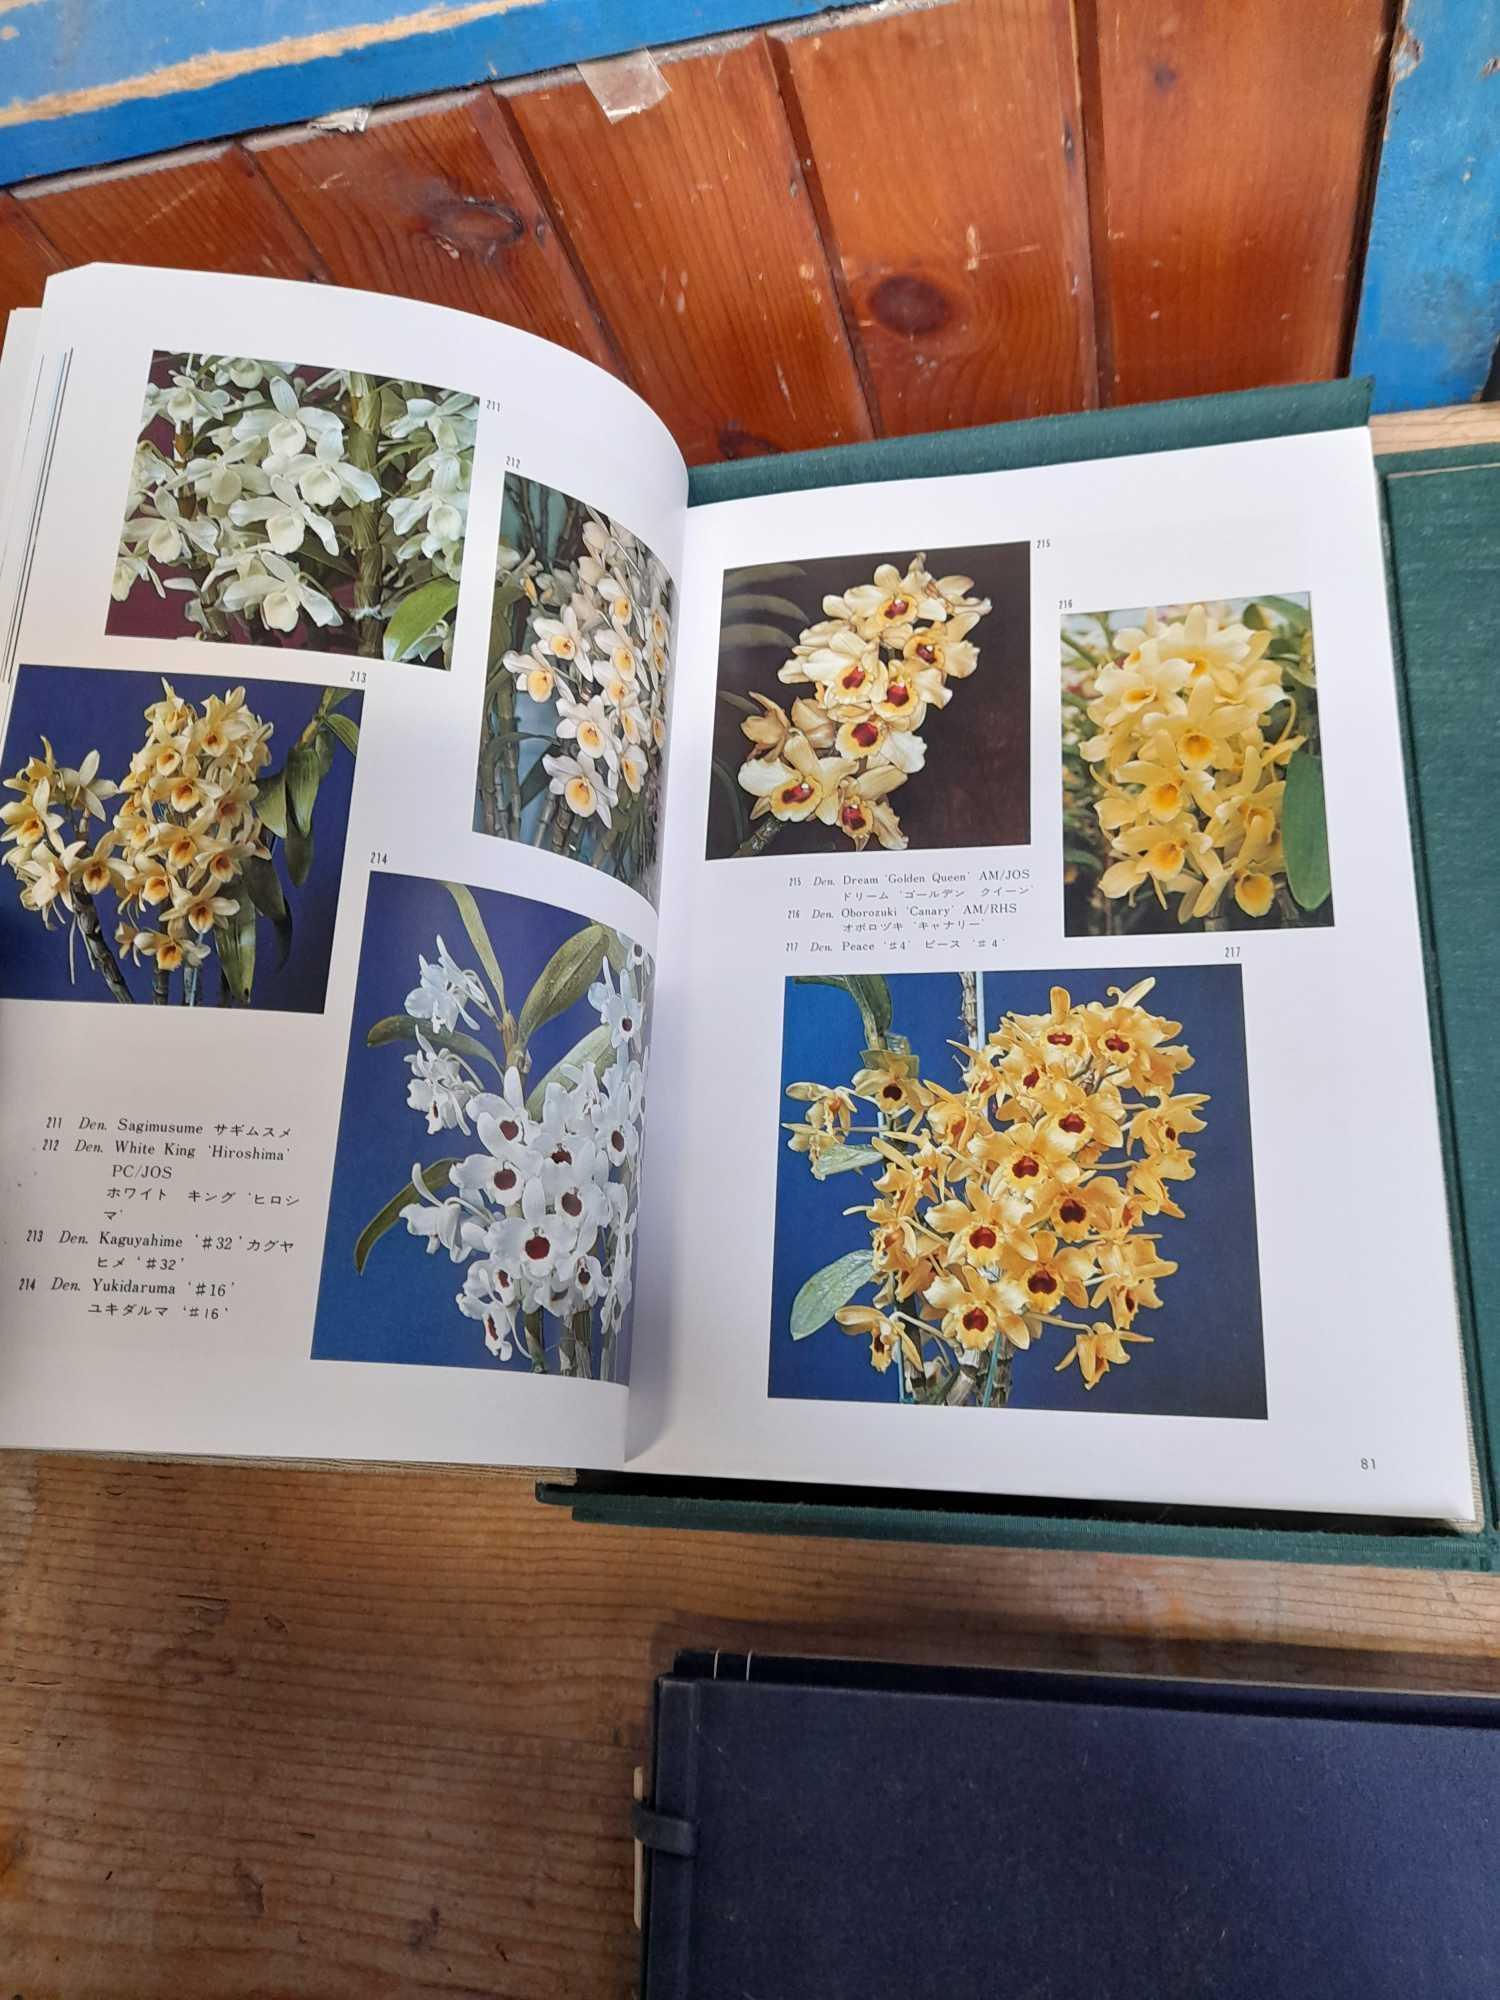 2 ORIENTAL BOOKS - Image 6 of 14